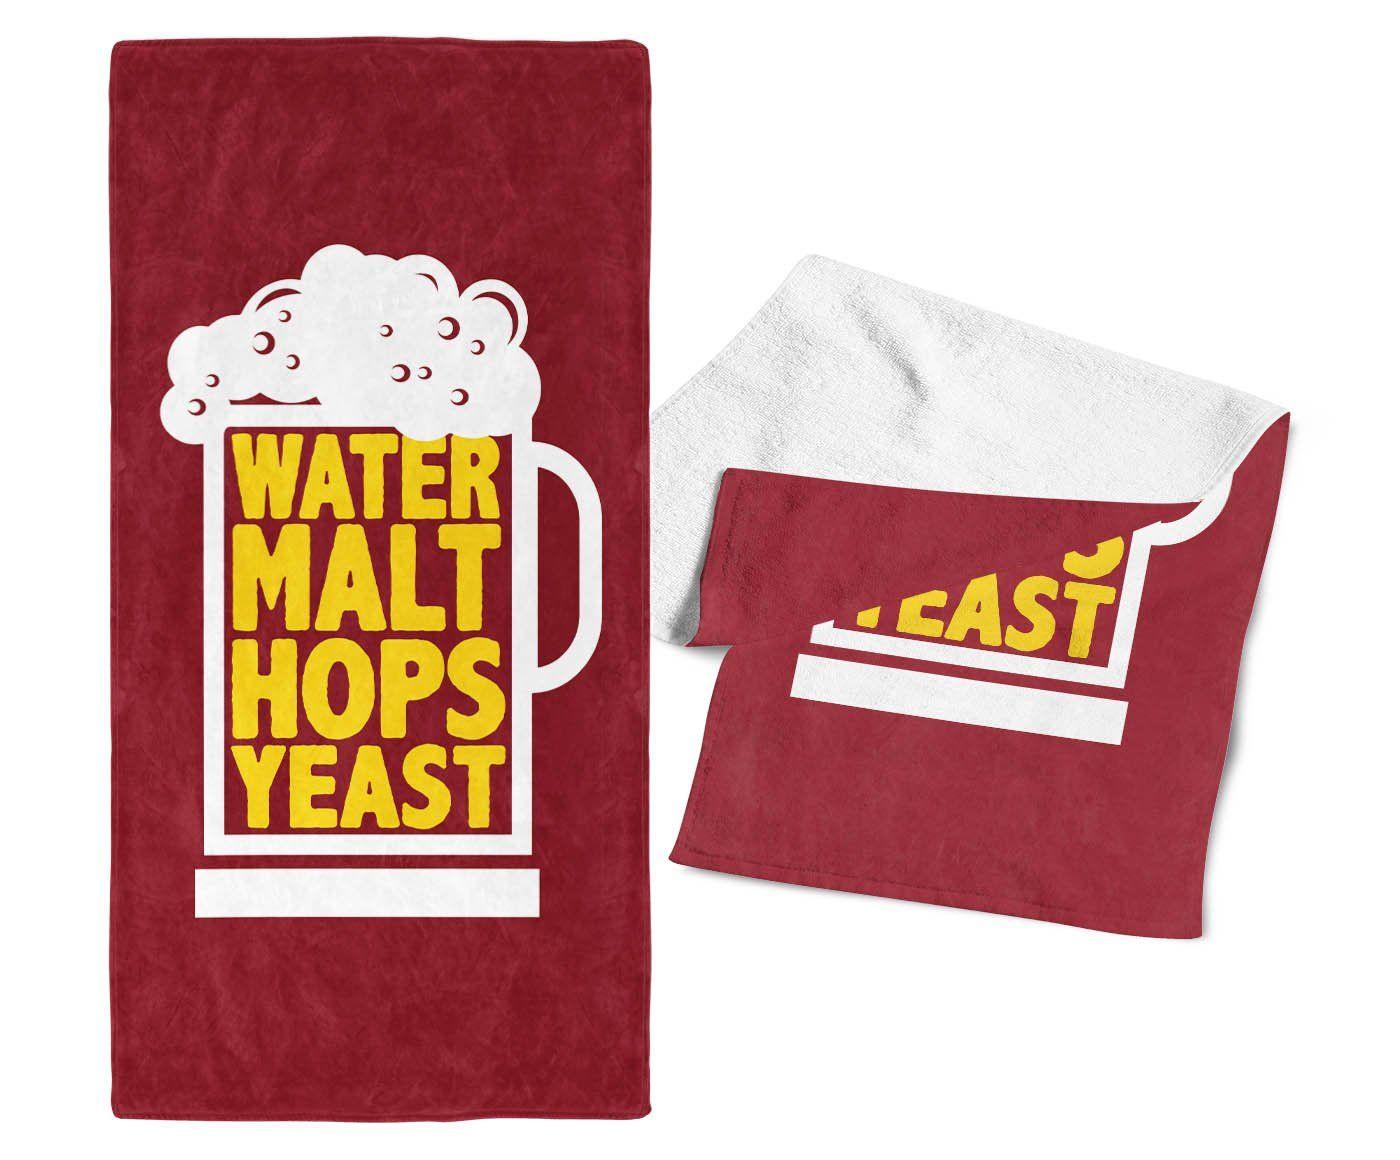 Water Malt Hops Yeast Bar Towel Malt, Yeast, Towel